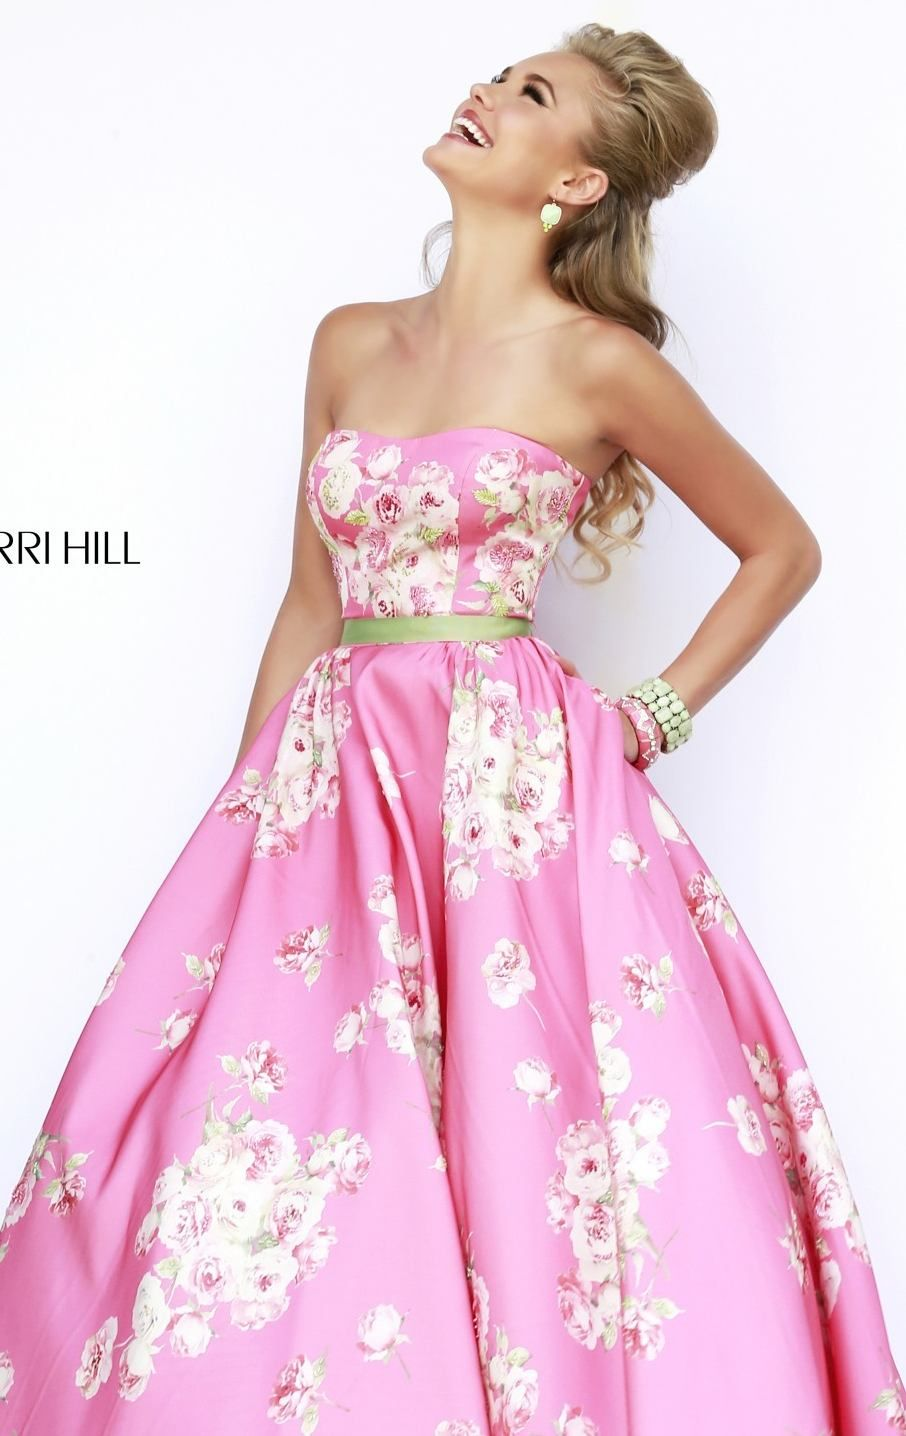 Sherri hill dress missesdressy renew pinterest